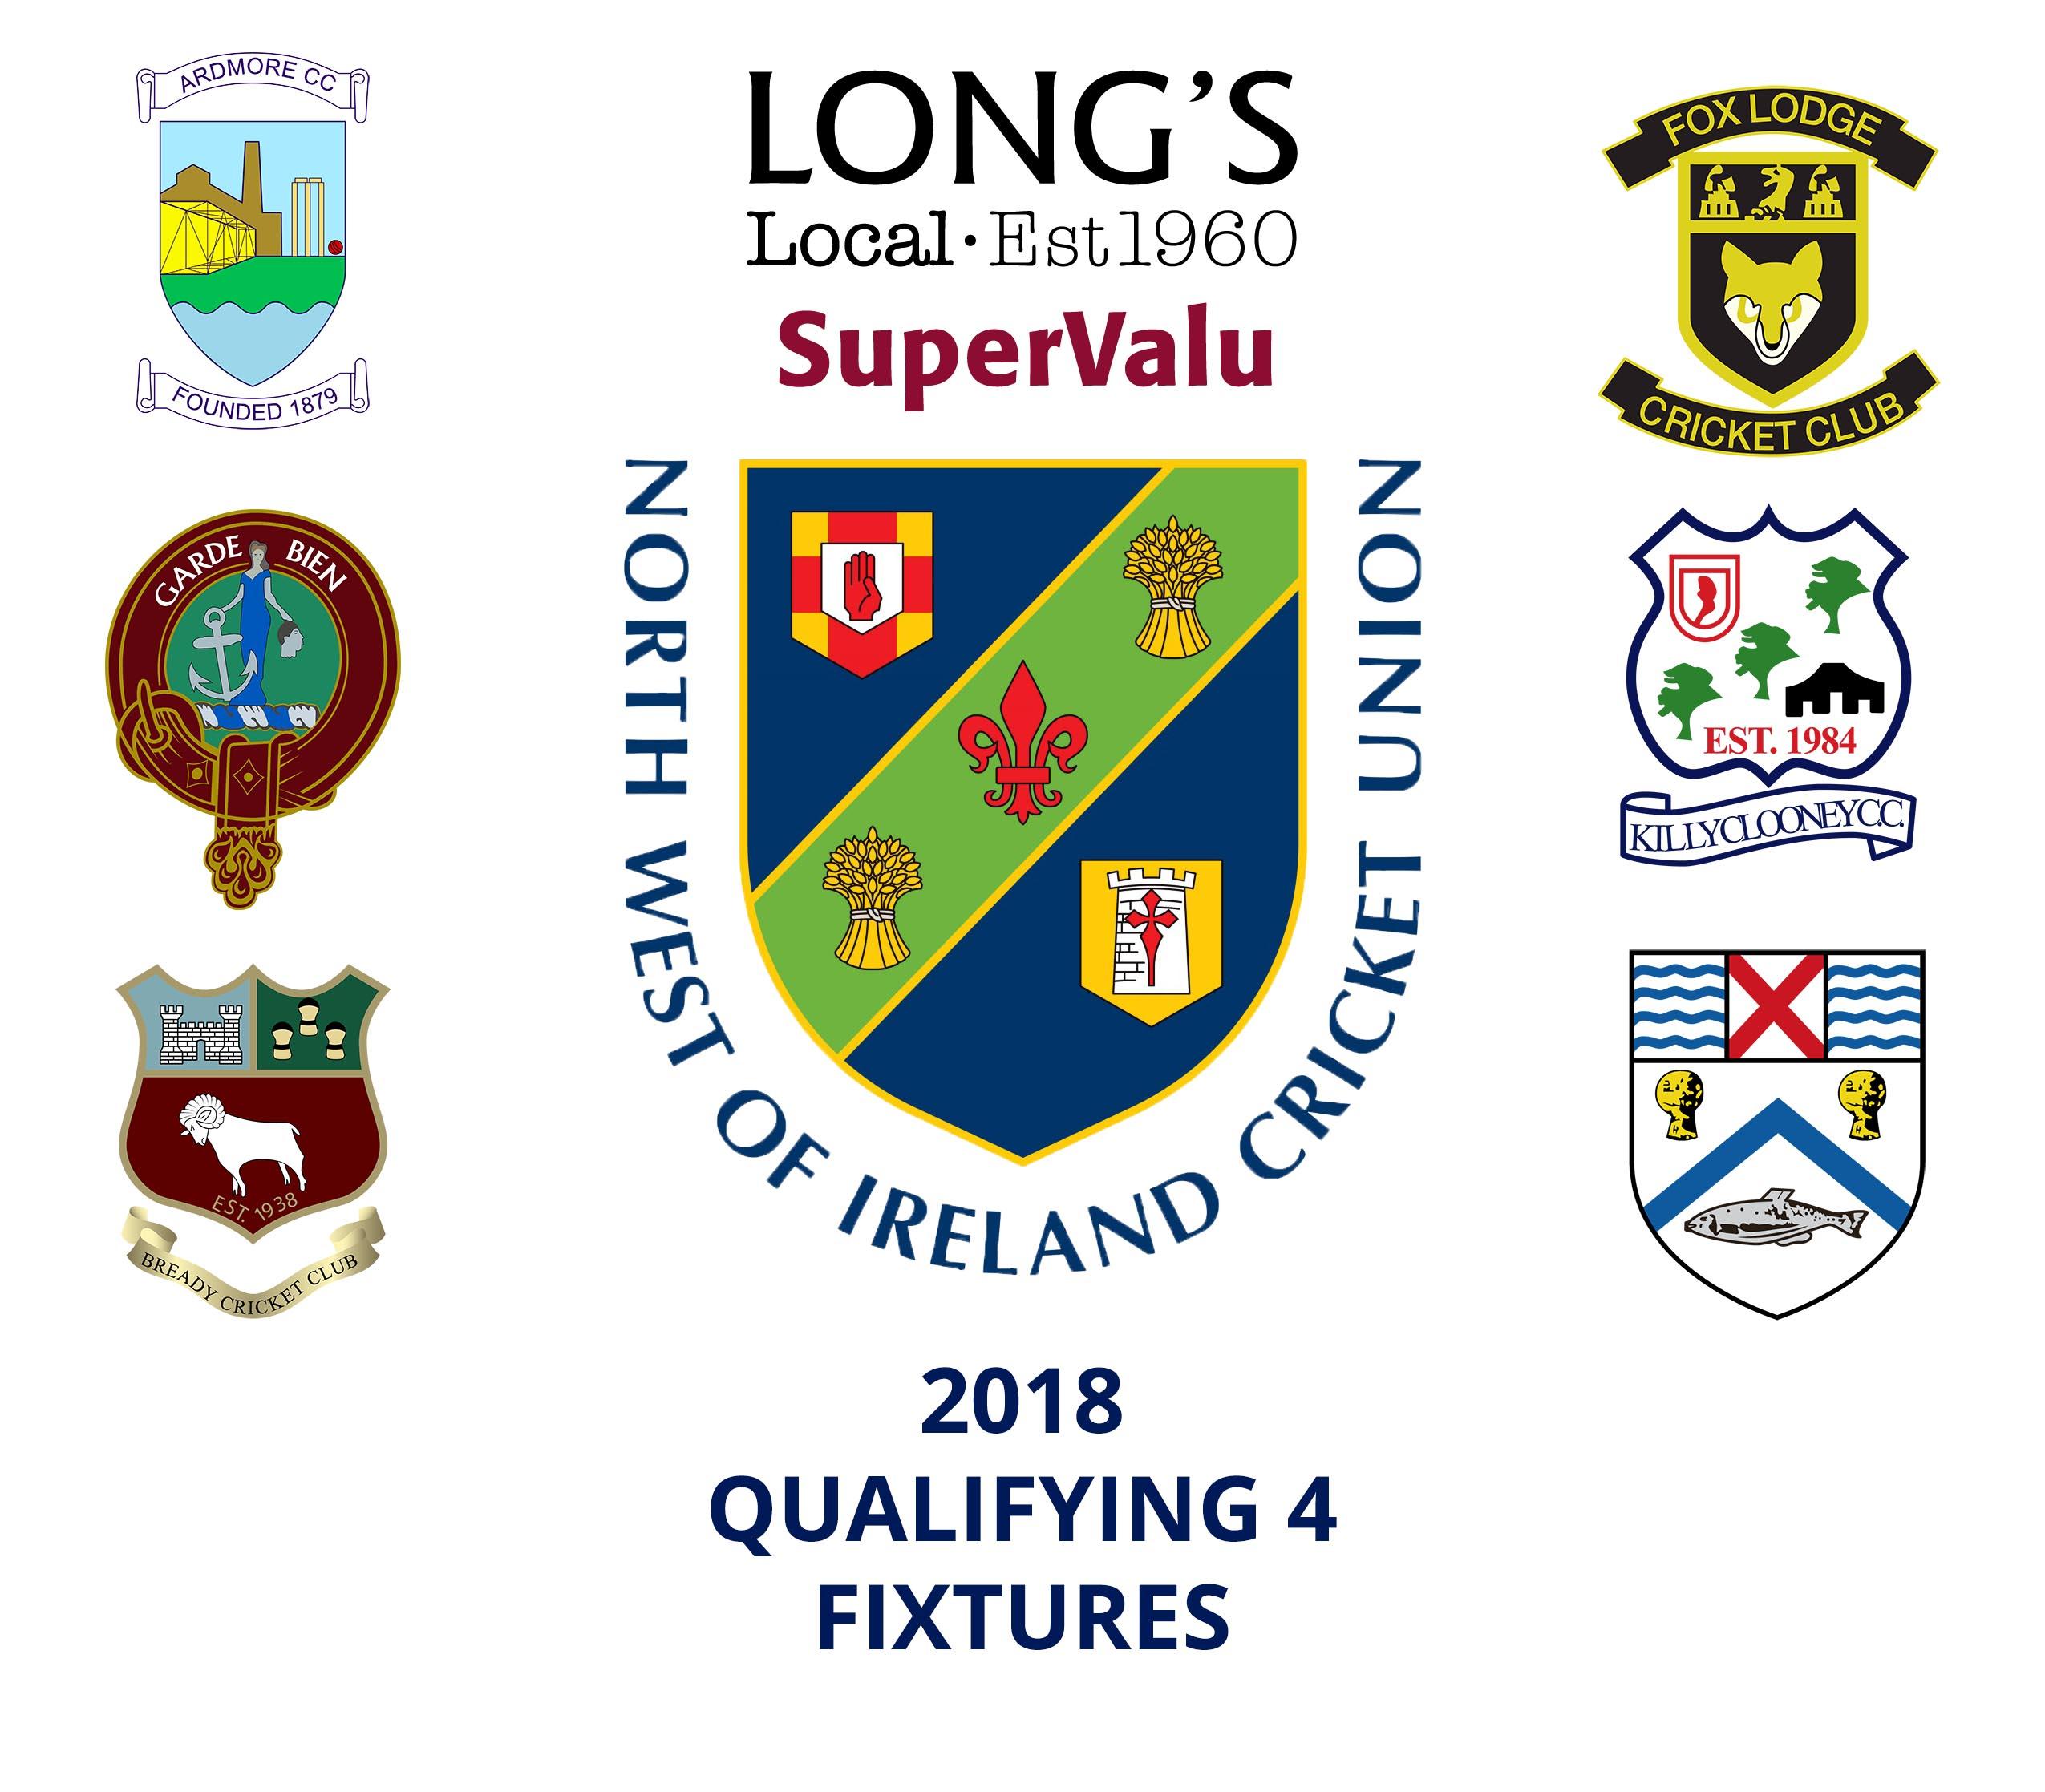 2018 Fixtures Qualifying 4